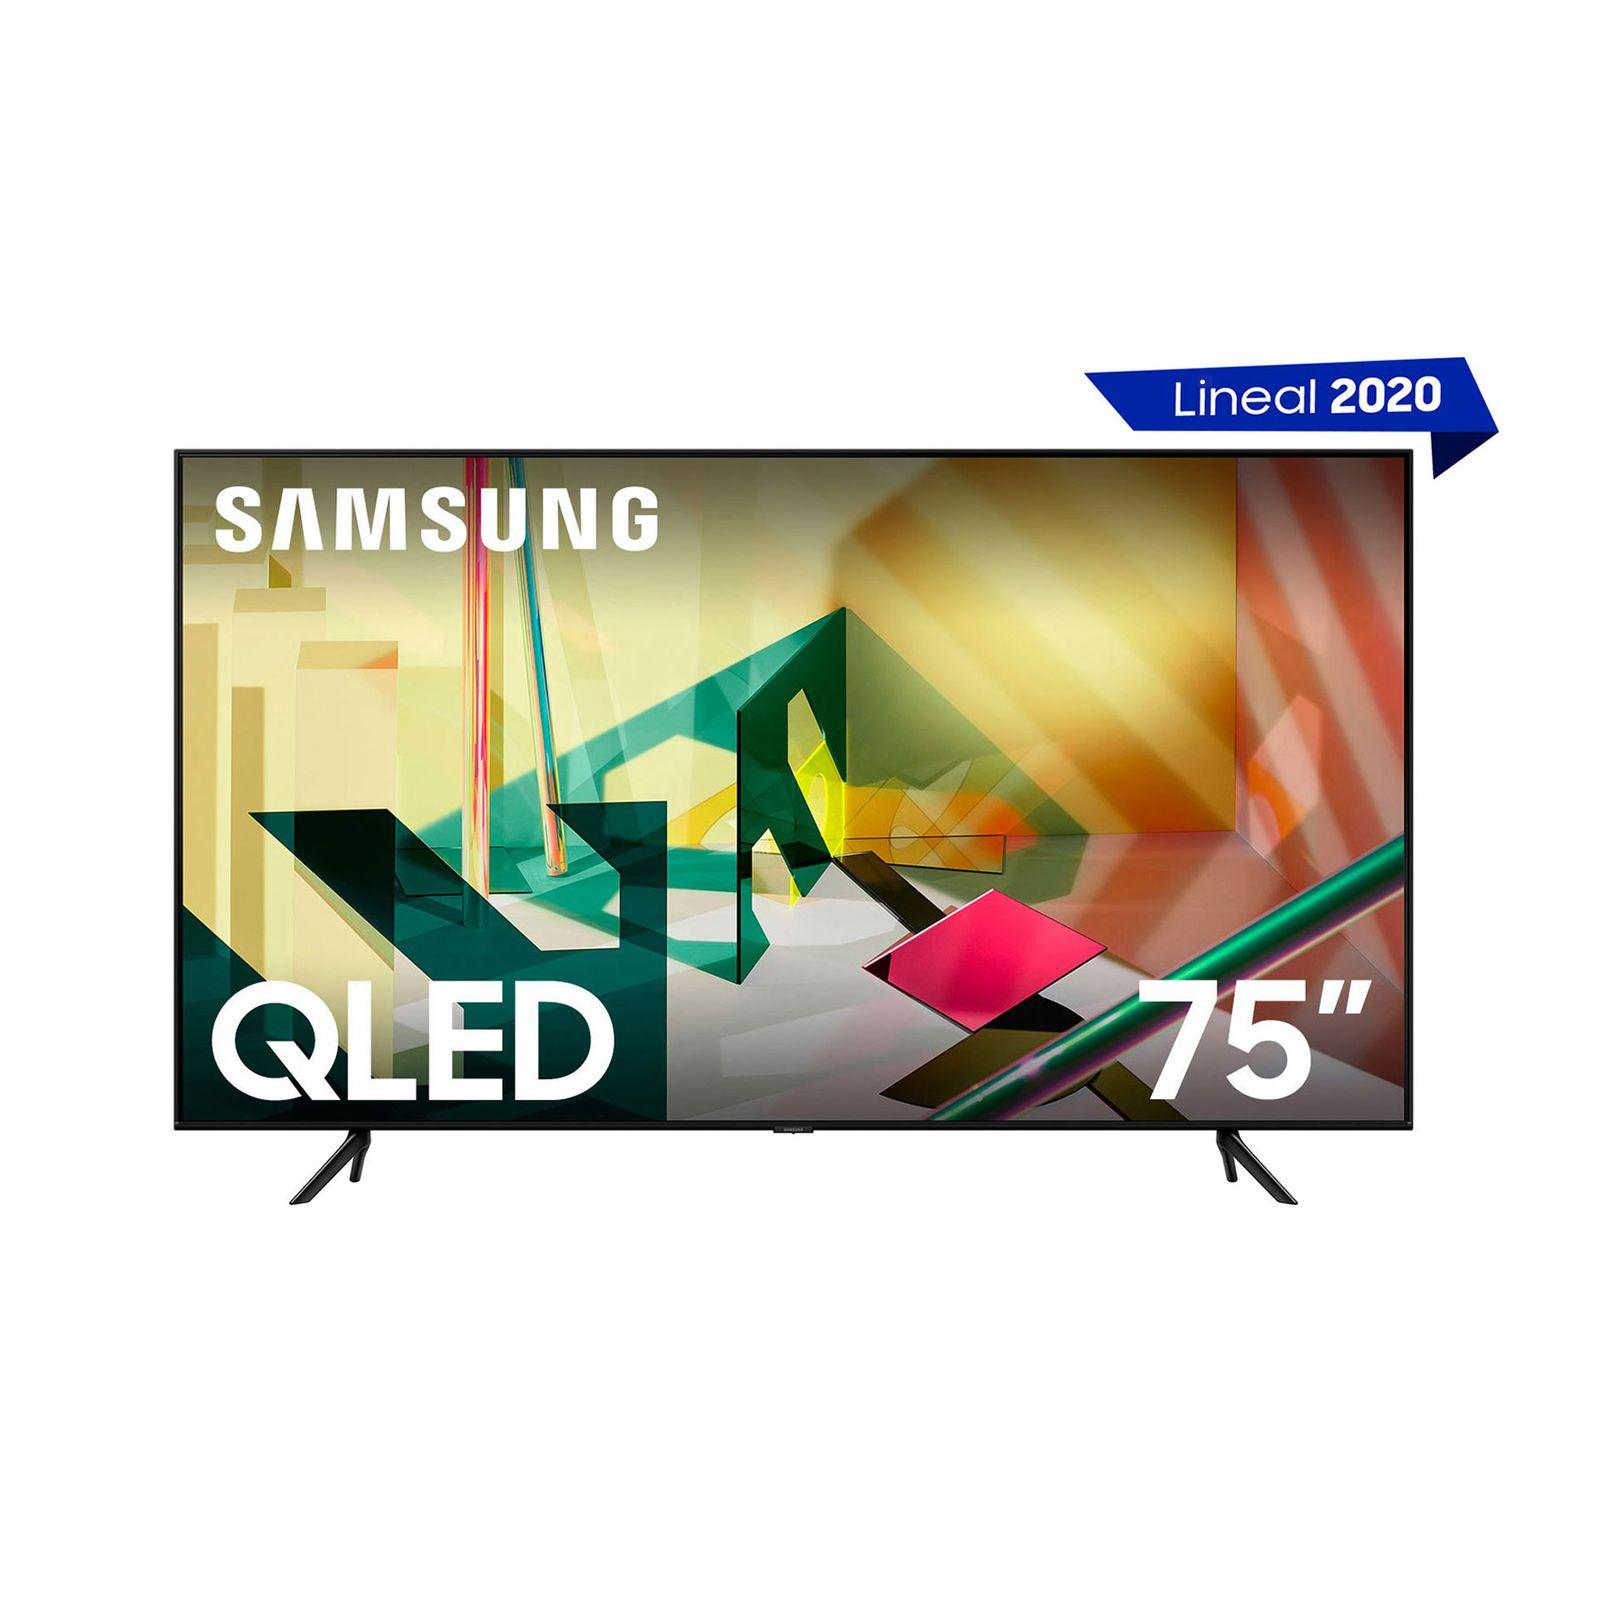 "Costco: Samsung Pantalla 75"" QLED 4K SMART TV QN75Q70TAFXZX con PayPal"